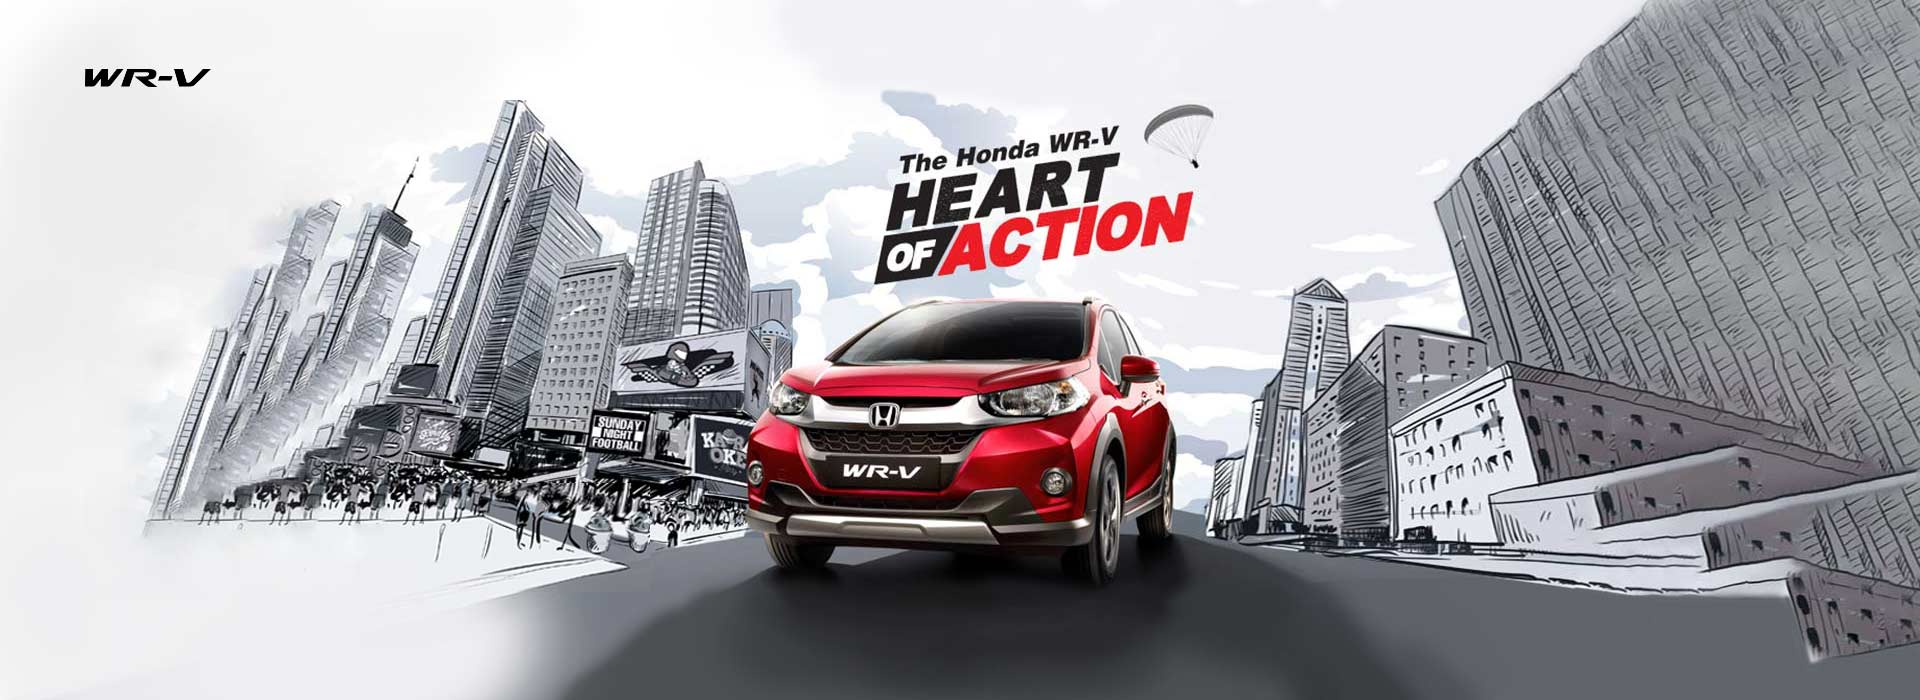 Brigade Honda Authorized New Car Dealership Serving And Servicing